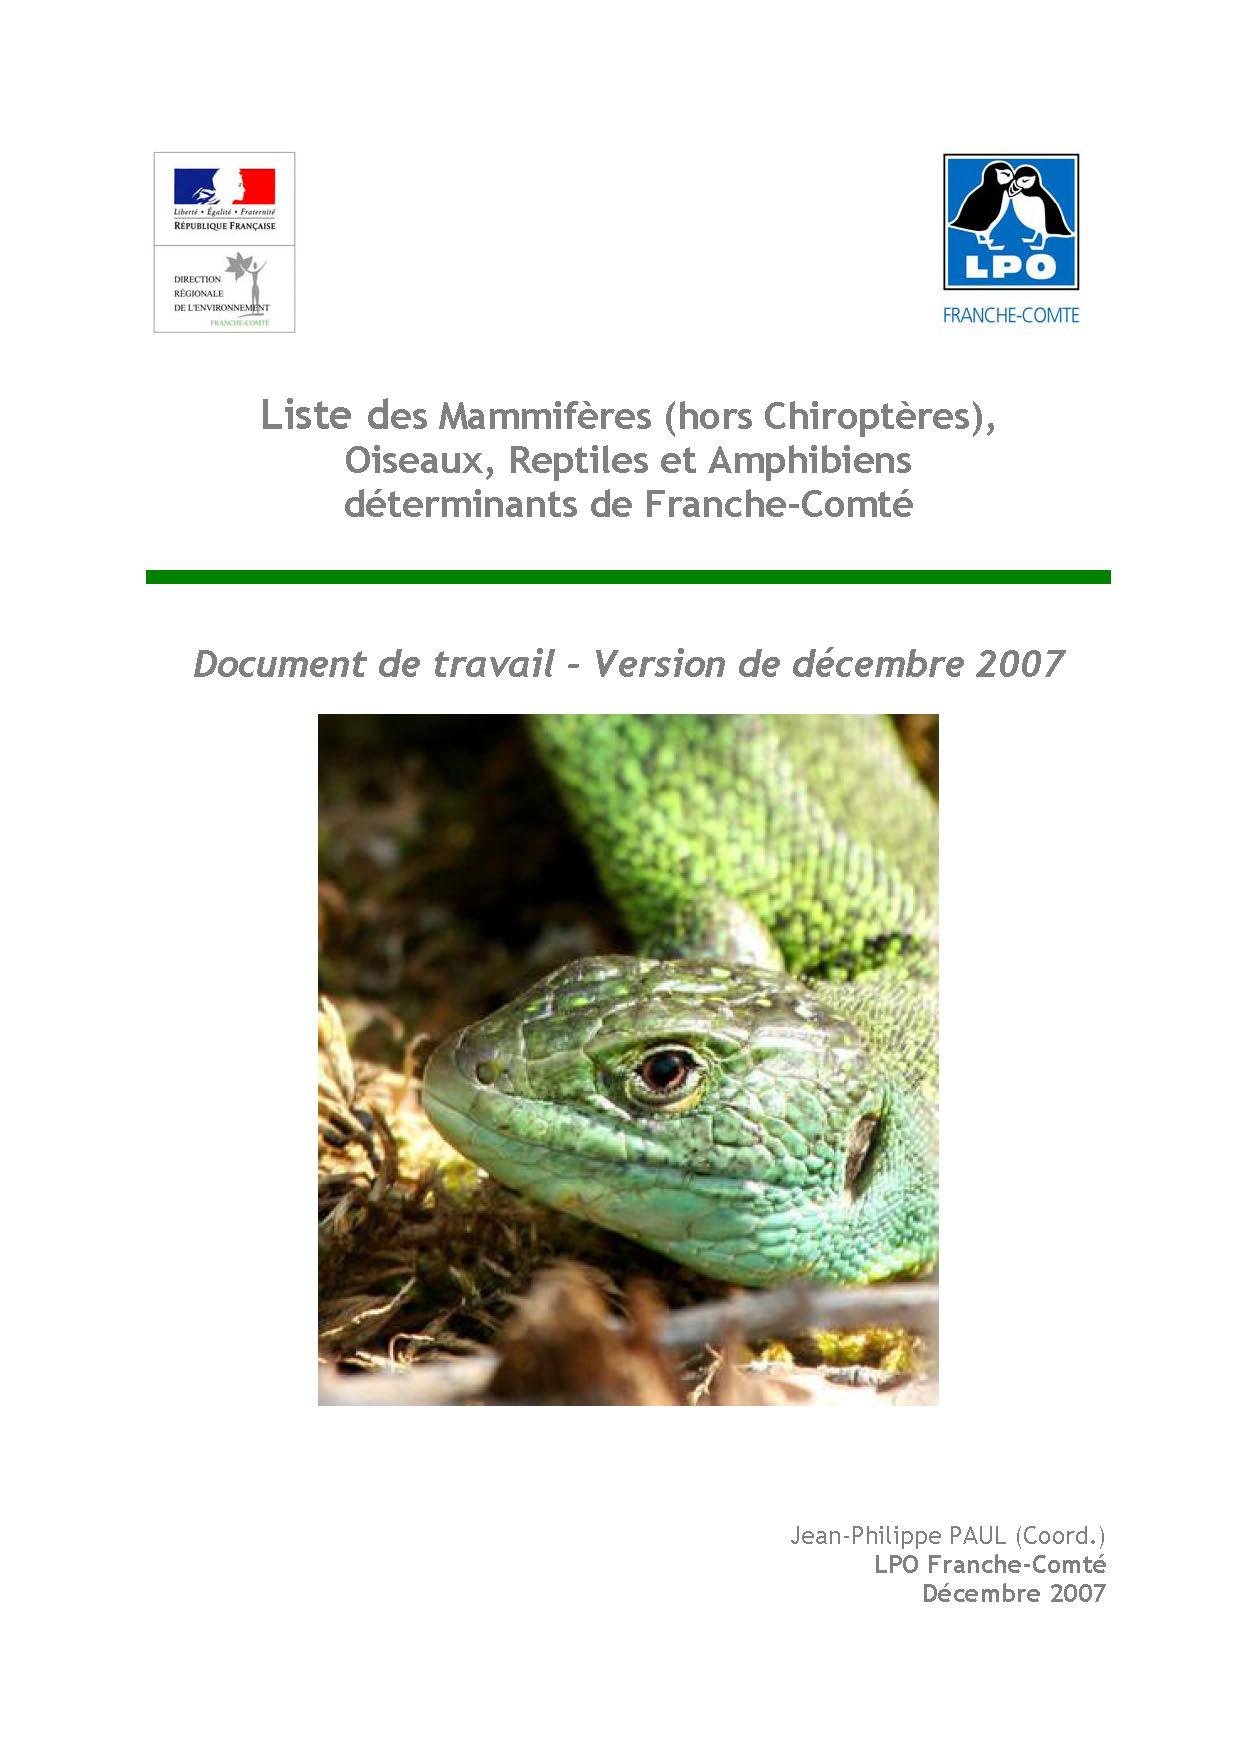 https://cdnfiles2.biolovision.net/franche-comte.lpo.fr/userfiles/proteger/Protectionespces/ListedesMhCORAdterminantsFCjan08.pdf